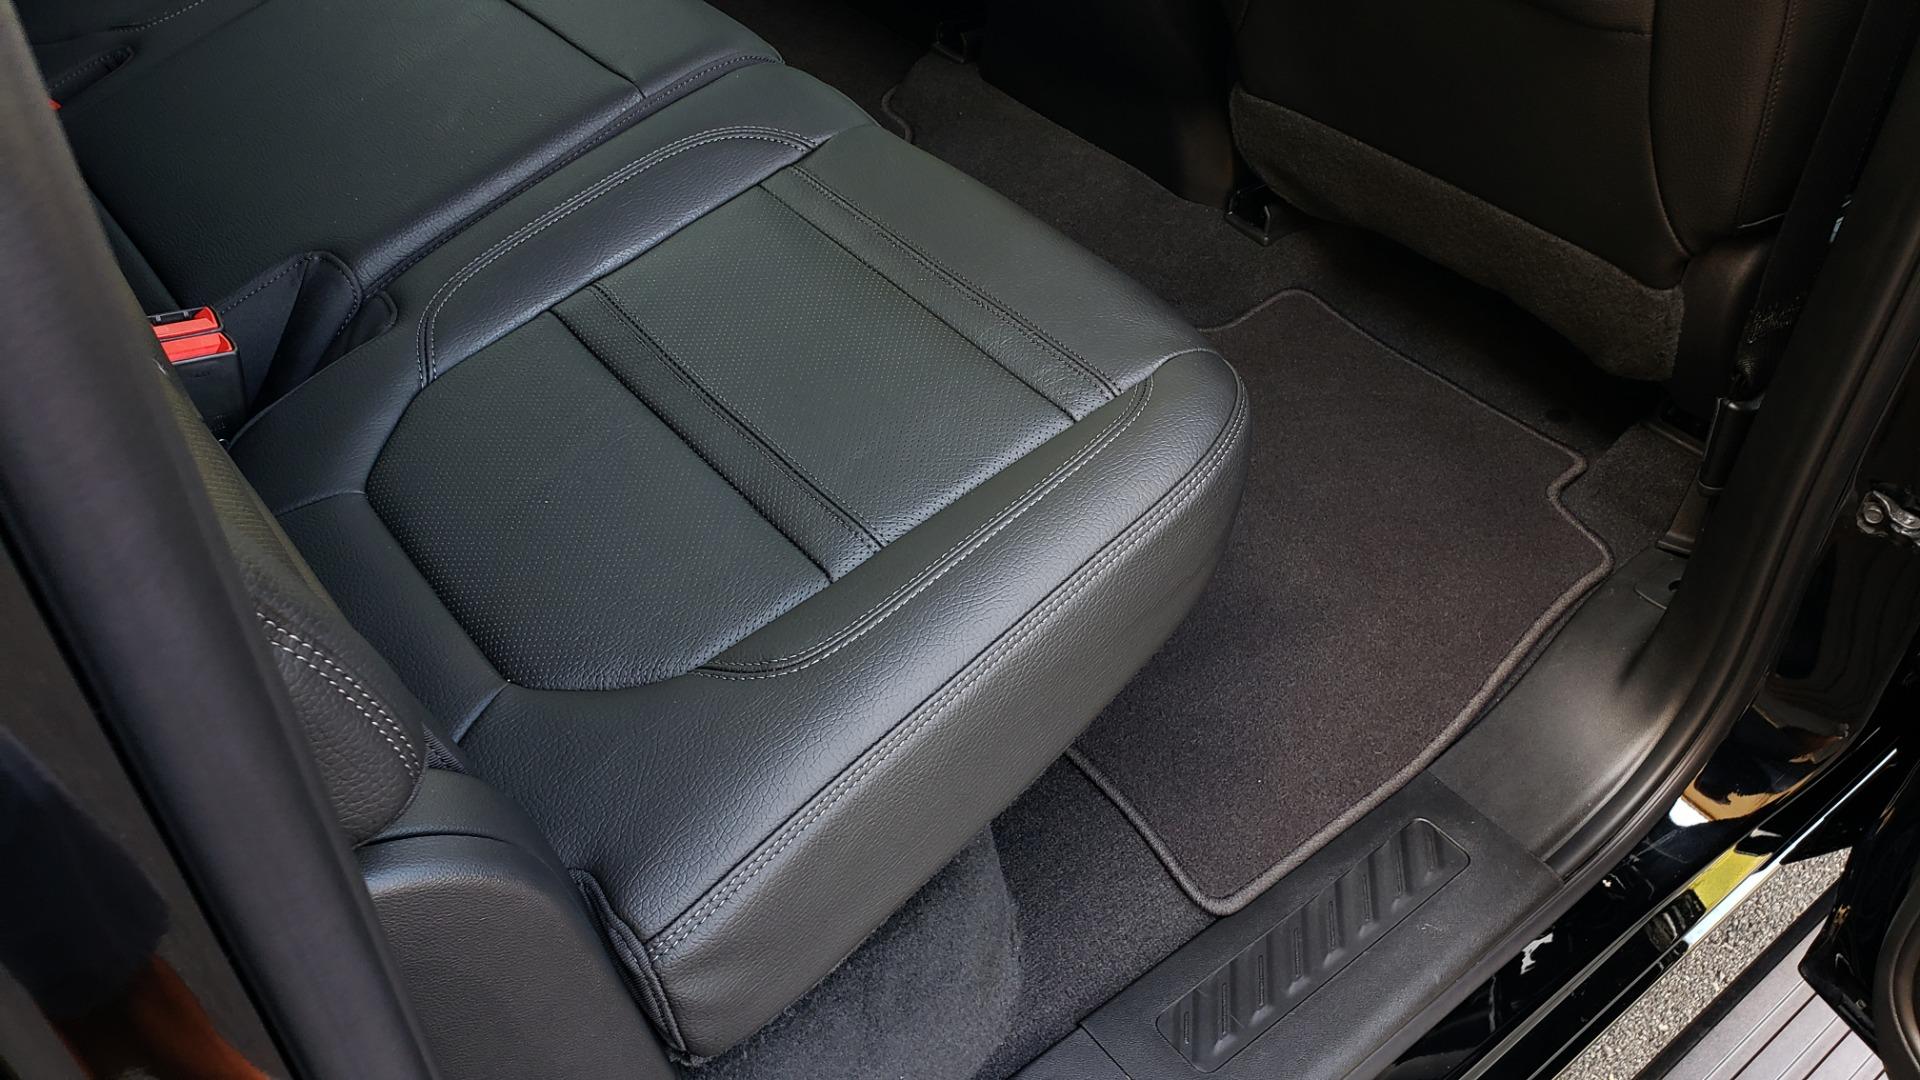 Used 2019 GMC SIERRA 1500 DENALI ULTIMATE 4WD / NAV / TECH PKG / DRVR ALRT for sale Sold at Formula Imports in Charlotte NC 28227 77